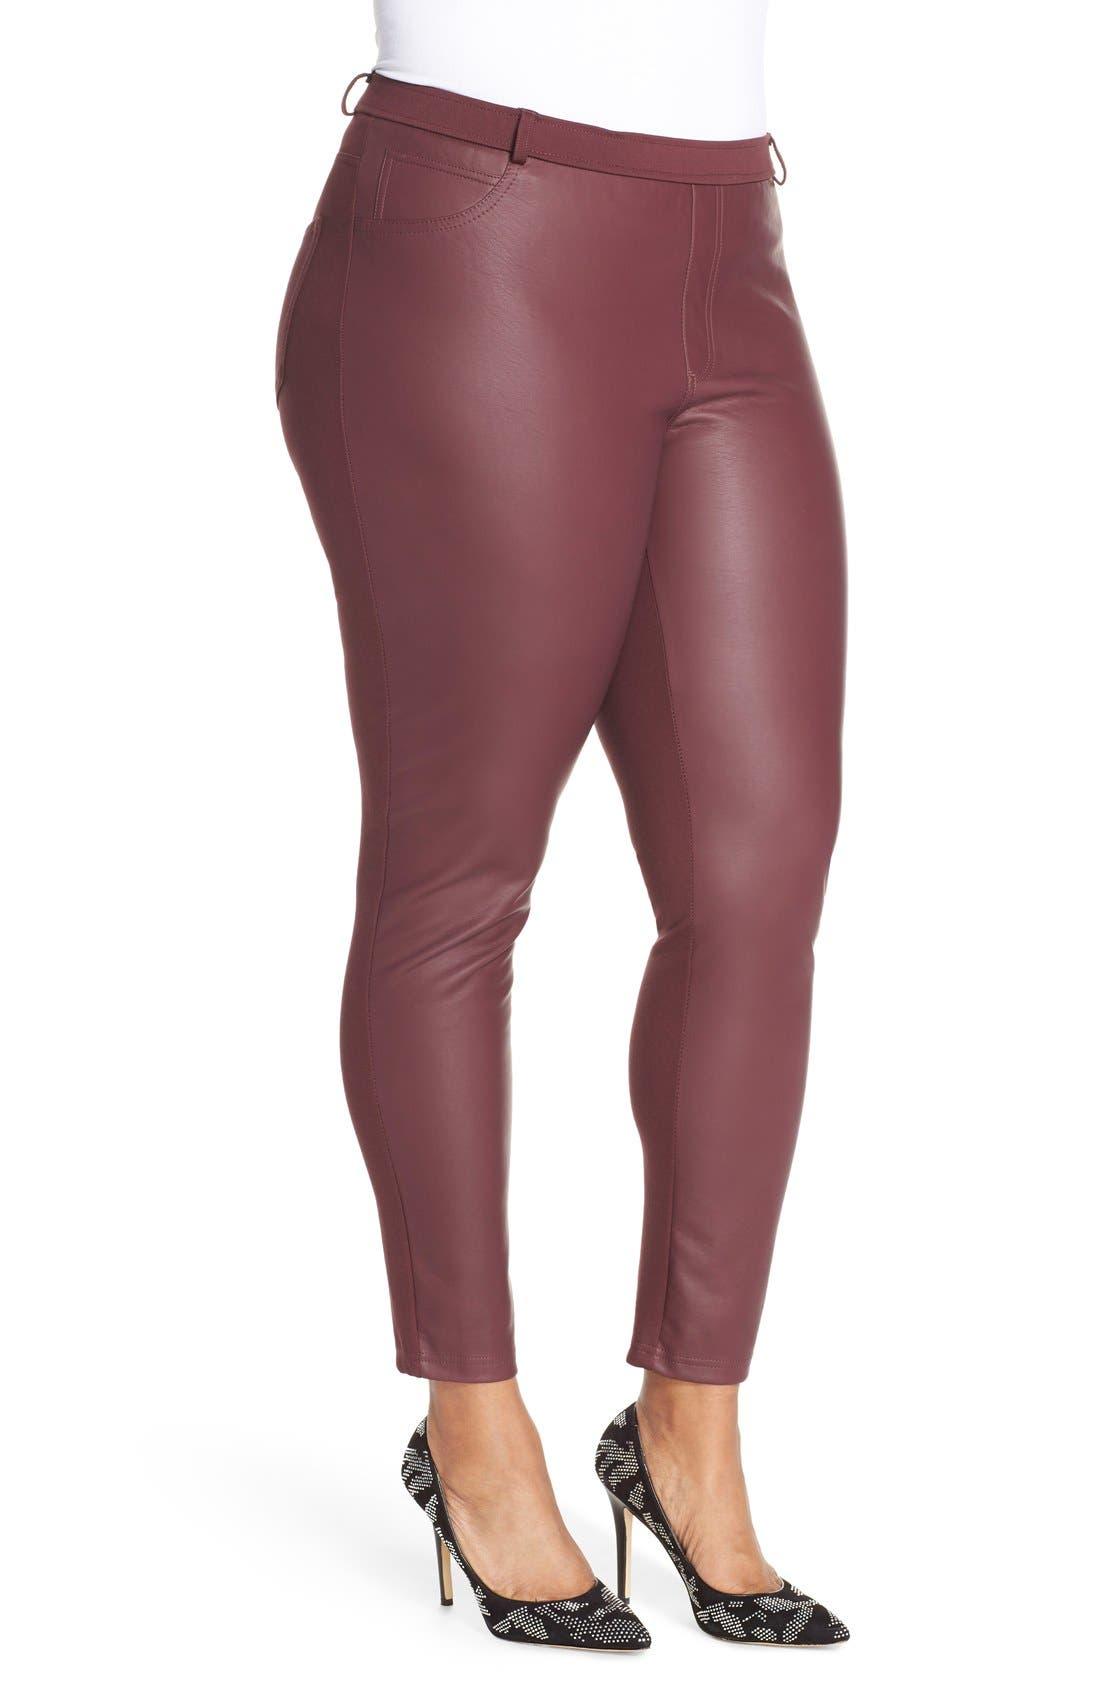 Alternate Image 3  - Tart 'Morgan' Faux Leather & Ponte Leggings (Plus Size)